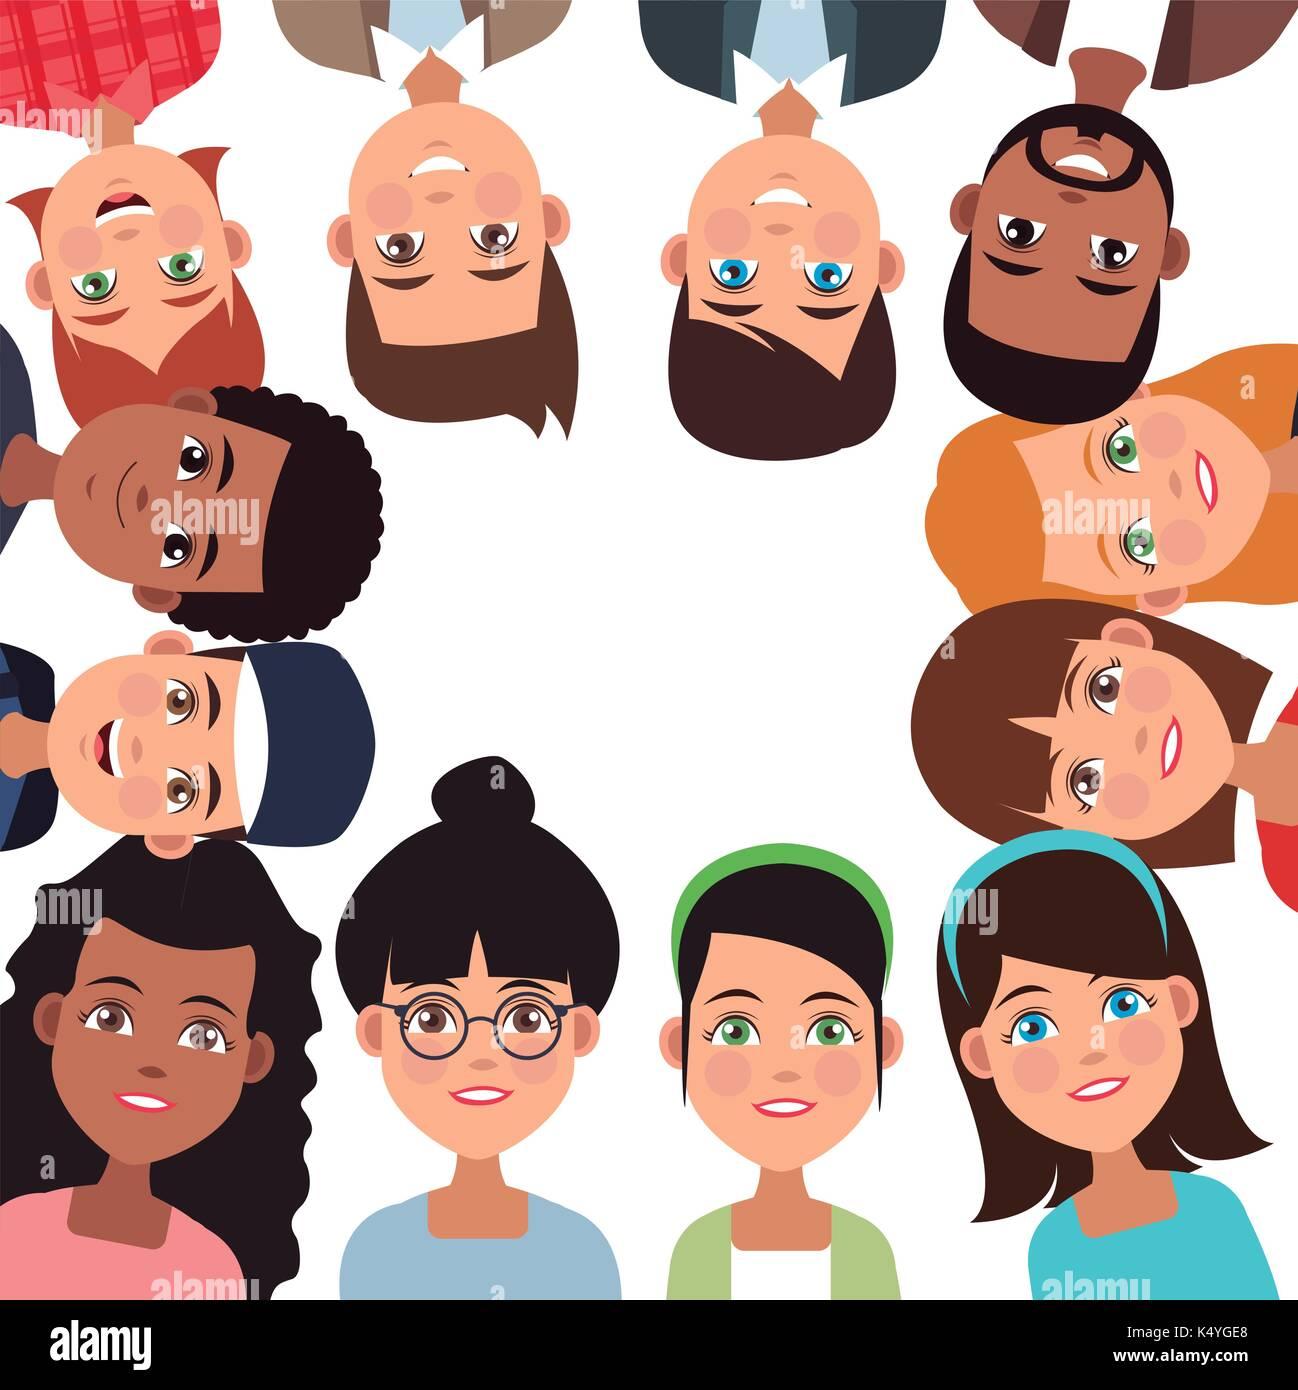 Amicizia design cartoon Immagini Stock